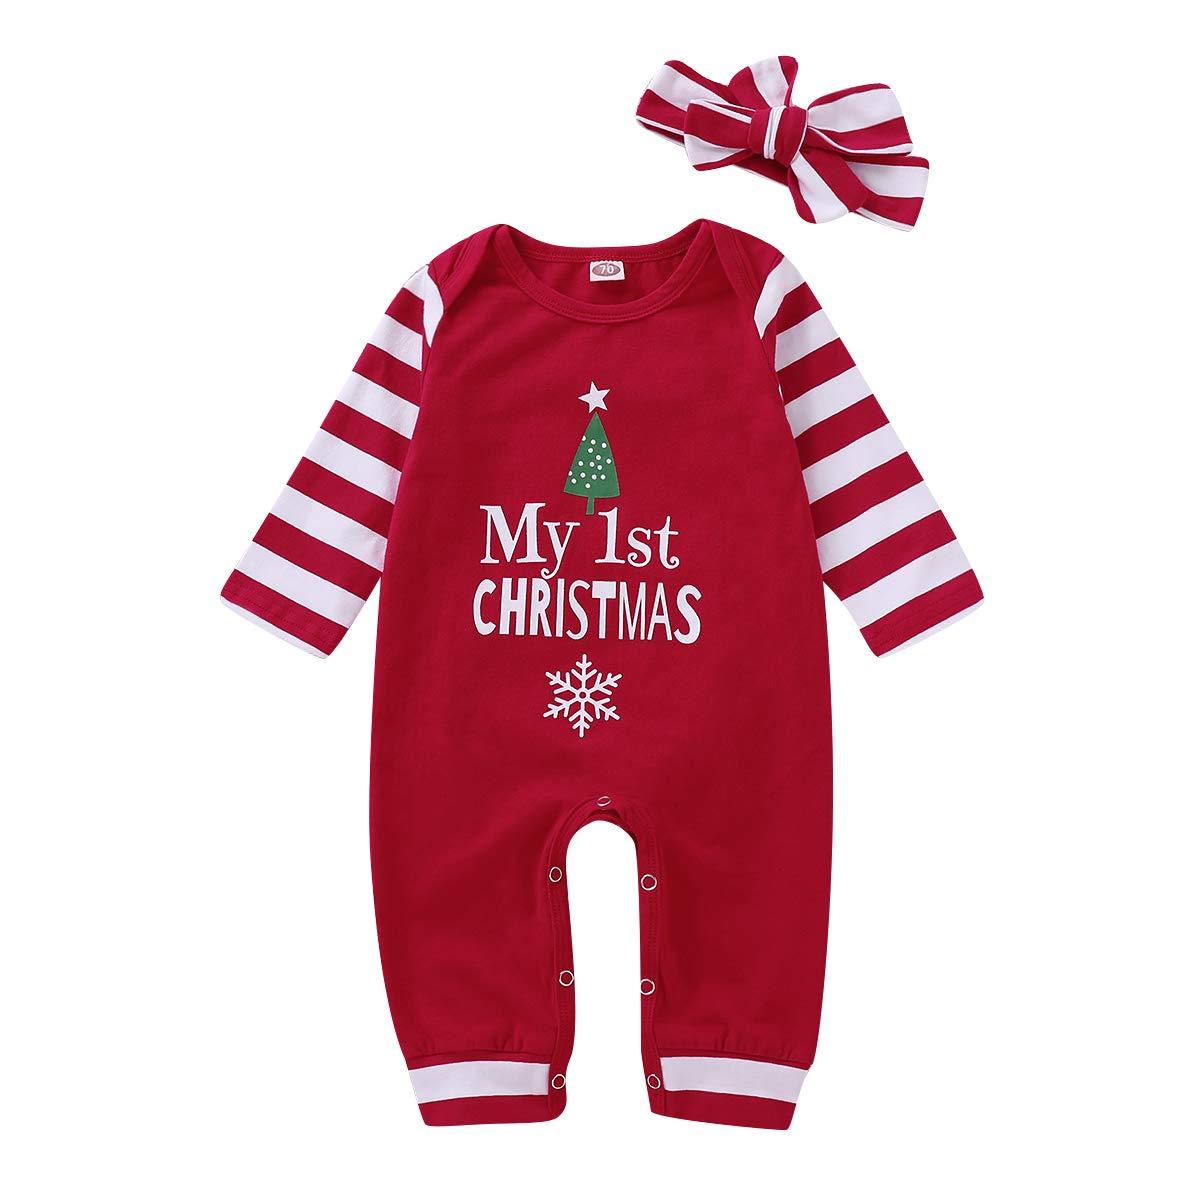 SOBOWO Christmas Romper Baby Boys Girls Long Sleeve Pajamas Jumpsuit Xmas Outfits + Hat